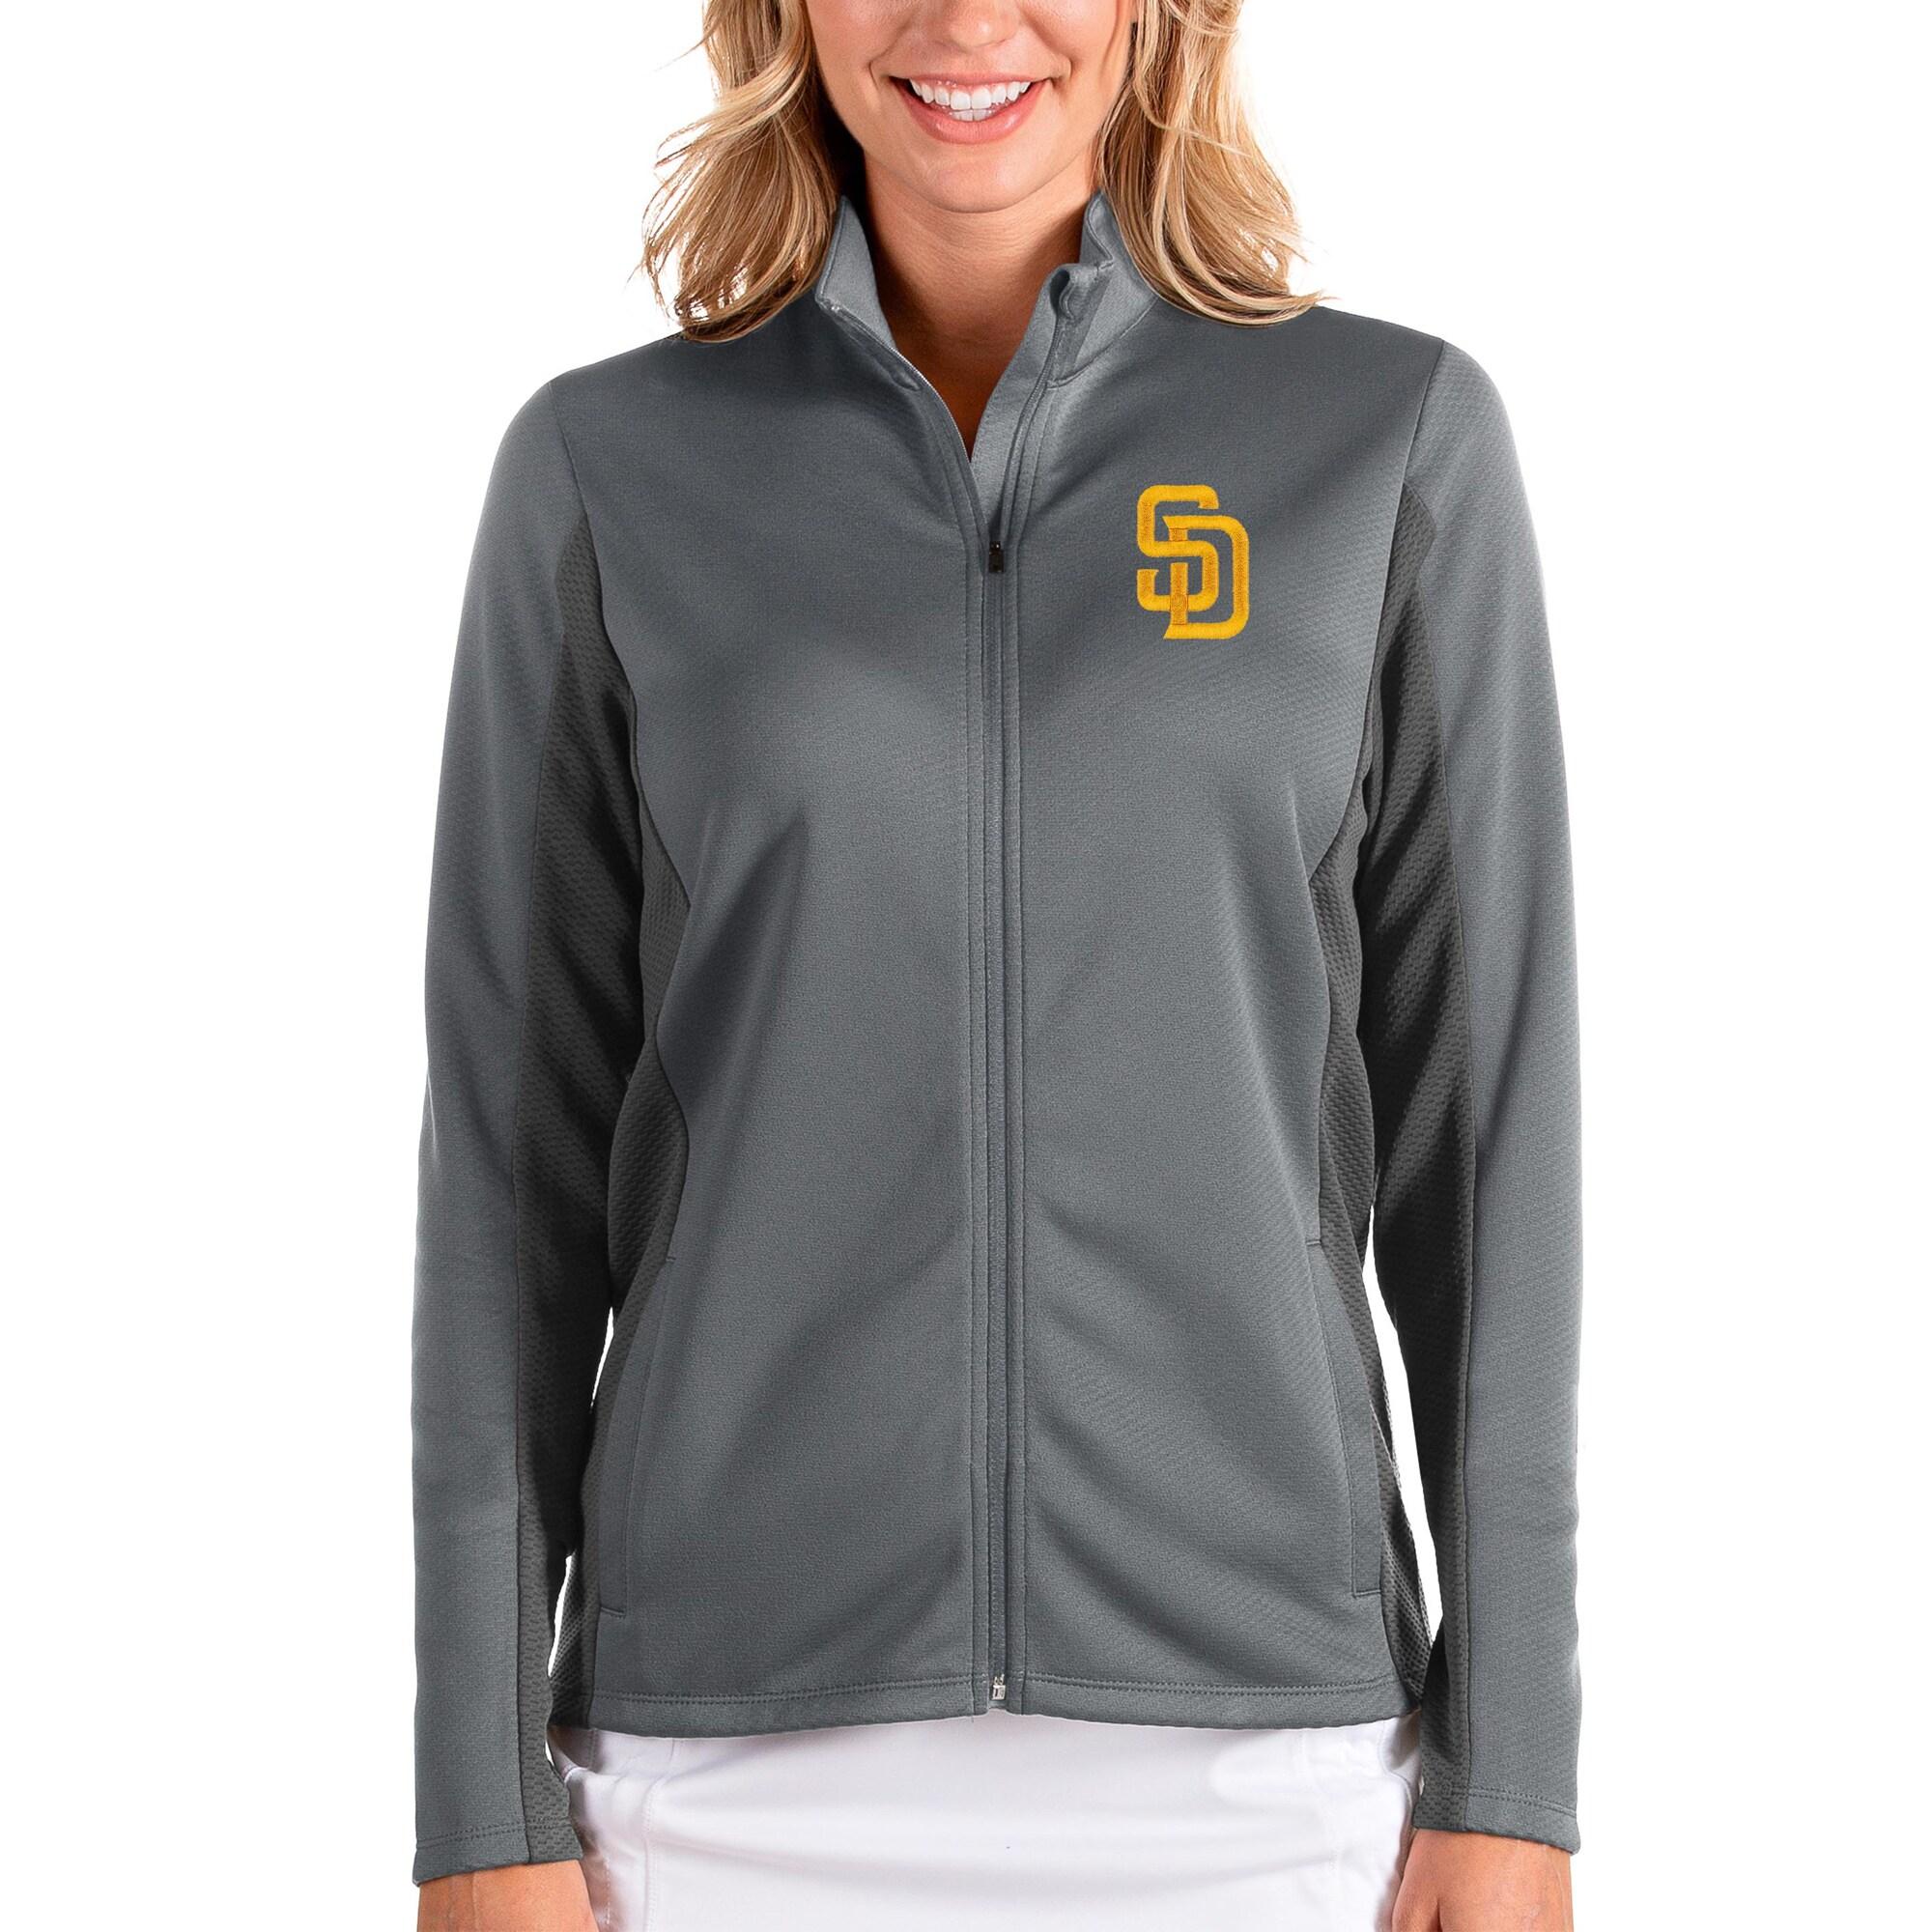 San Diego Padres Antigua Women's Passage Full-Zip Jacket - Steel/Charcoal